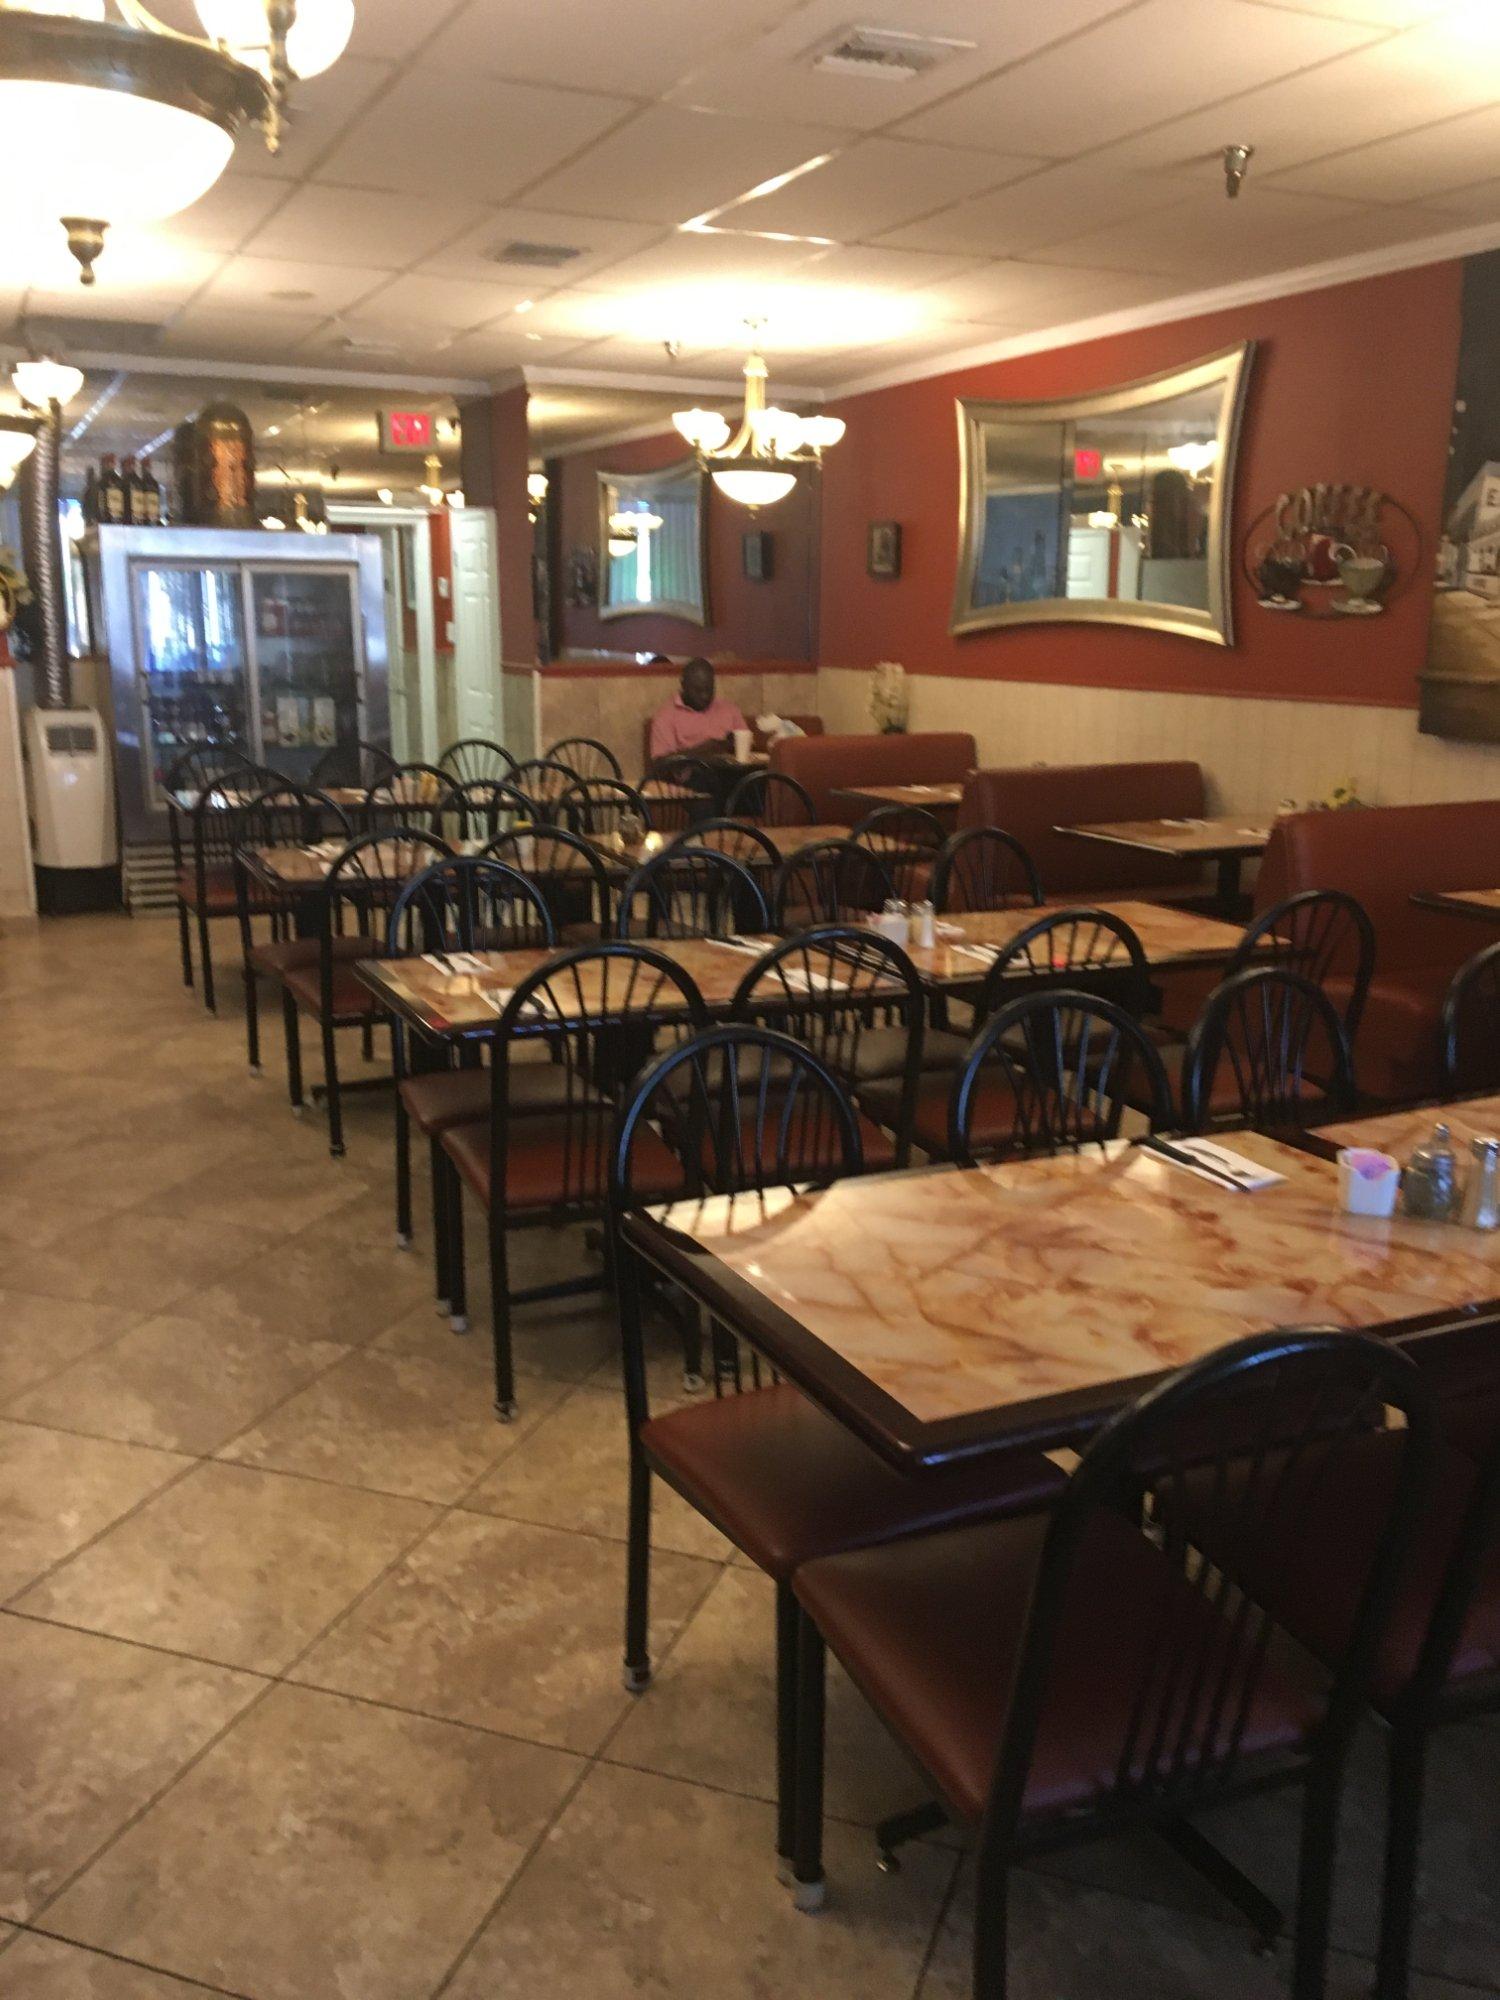 Jack s Pizza and Restaurant Delray Beach Restaurant Reviews